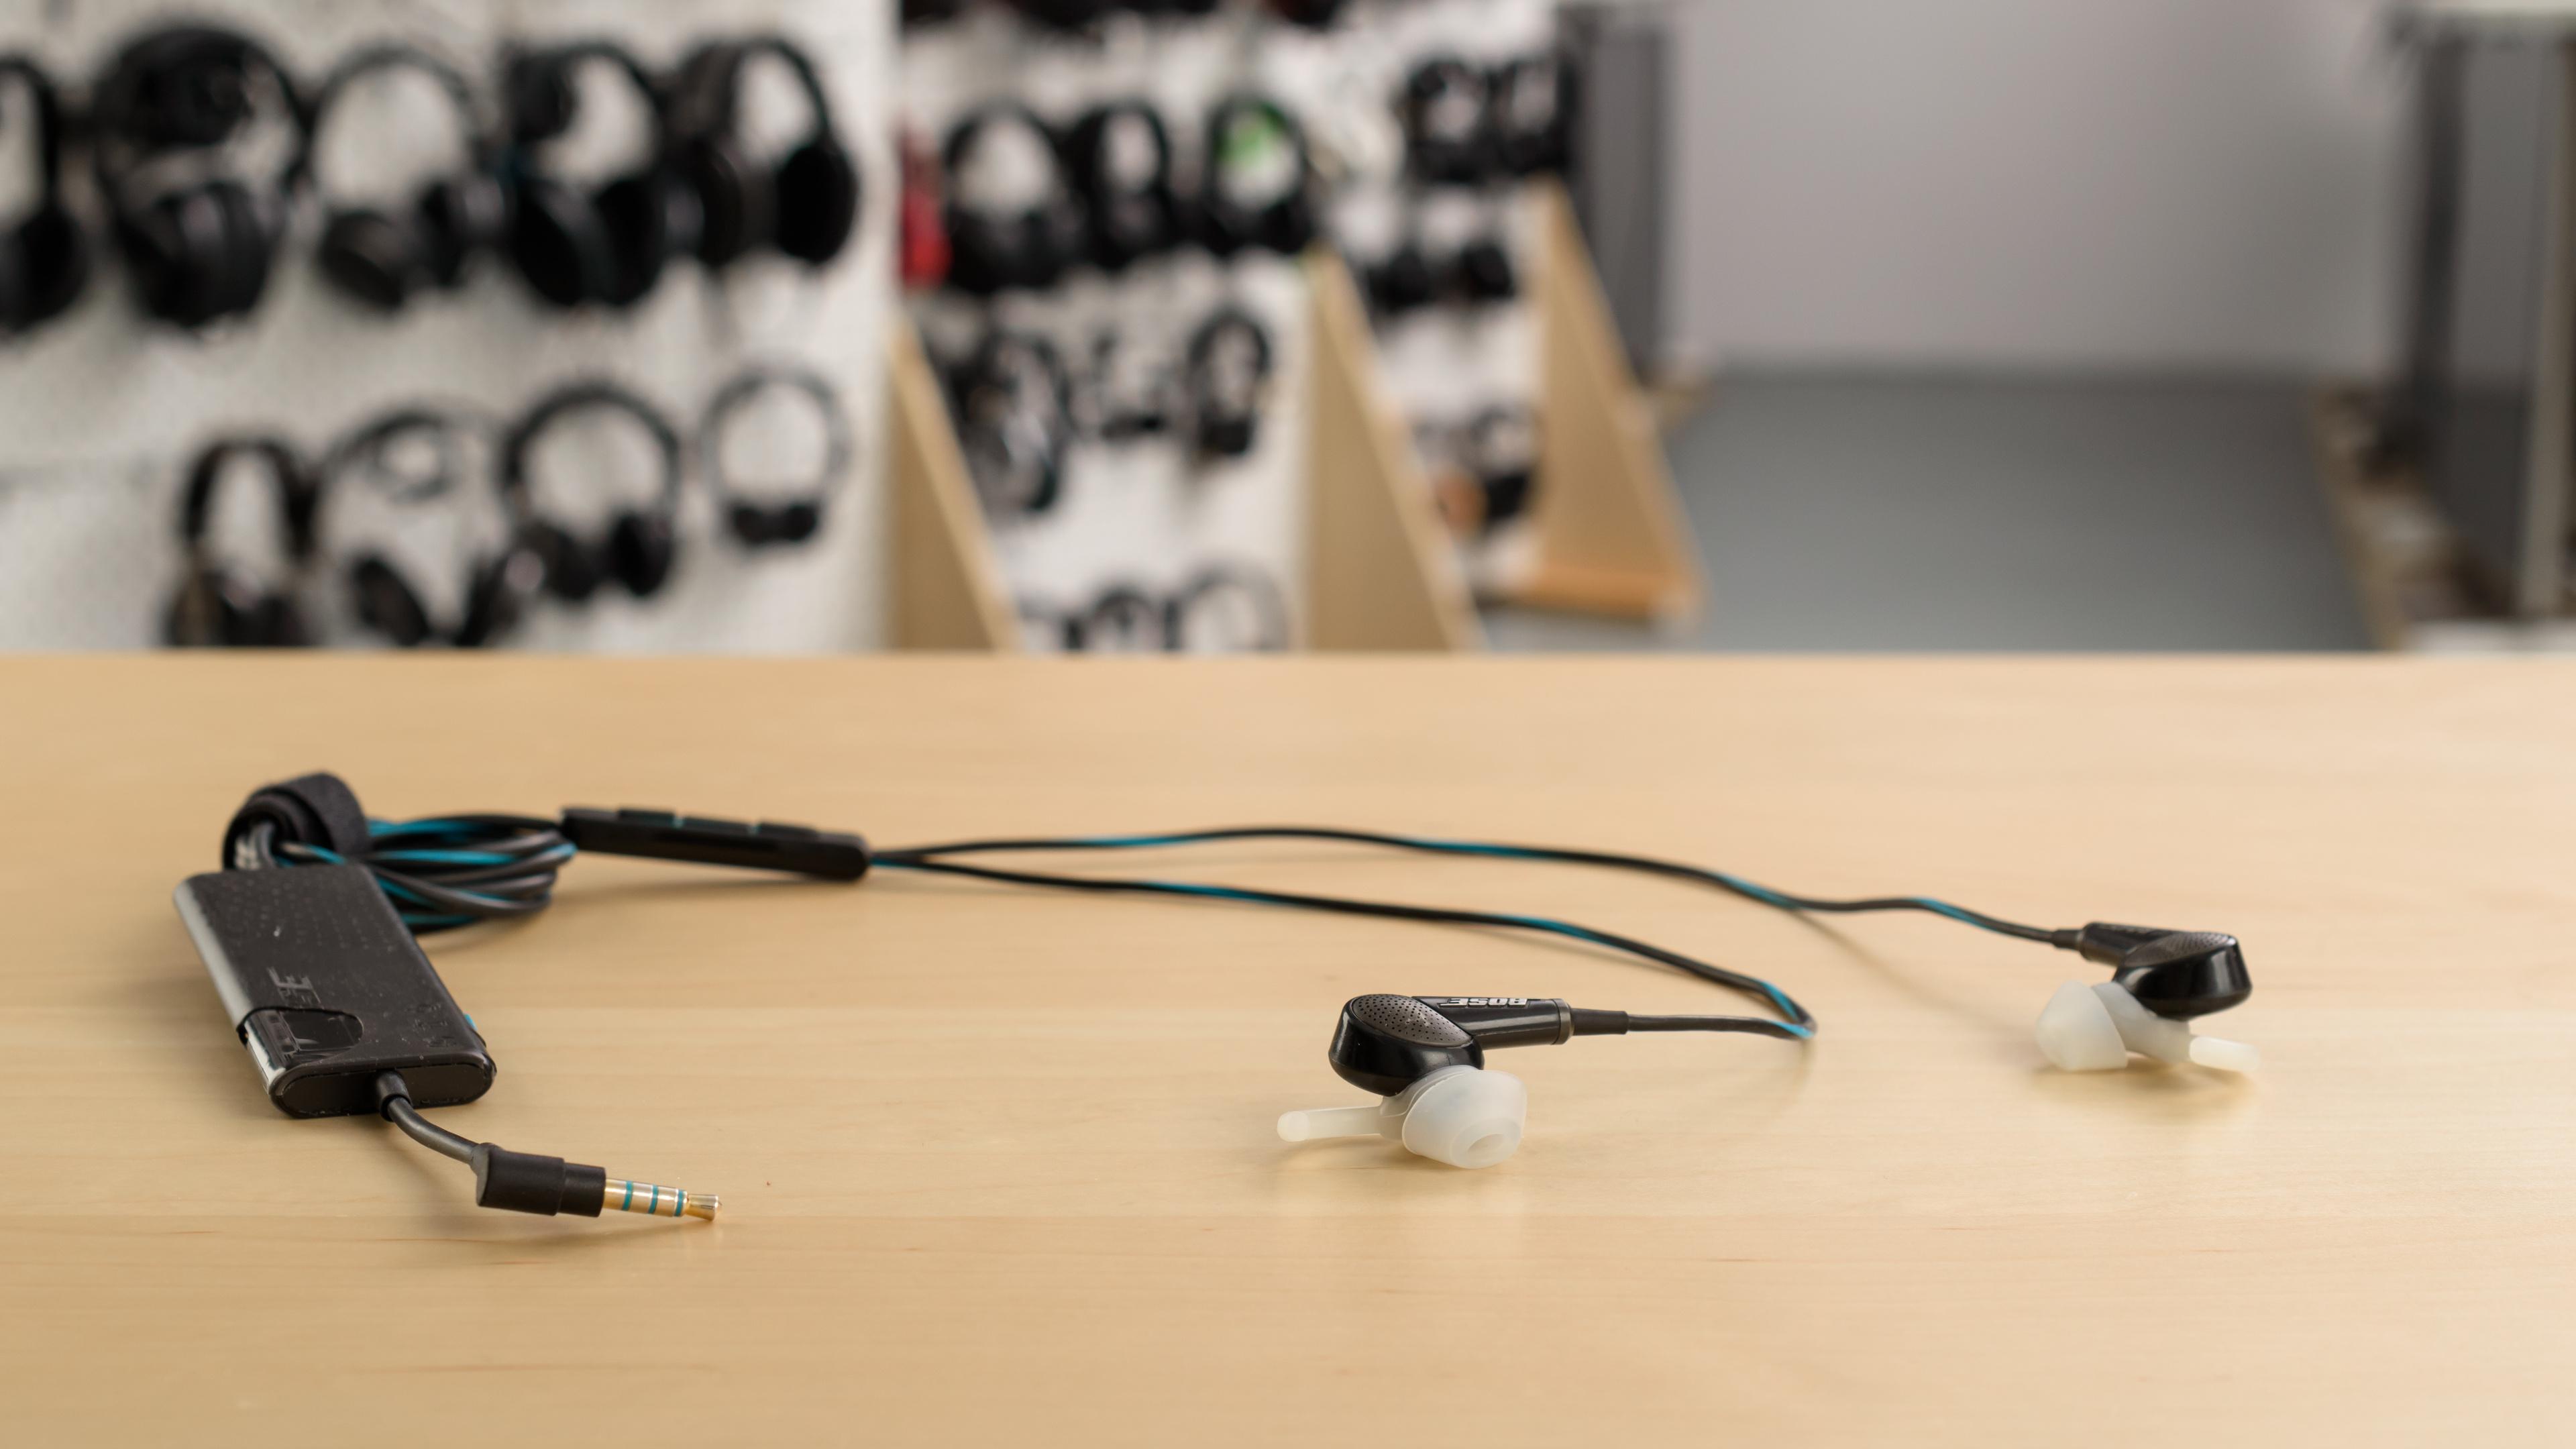 Polk Headphone Cable Wiring Diagram Schematic Diagrams Sennheiser Example Electrical Plug Bose Quietcomfort 20 Vs